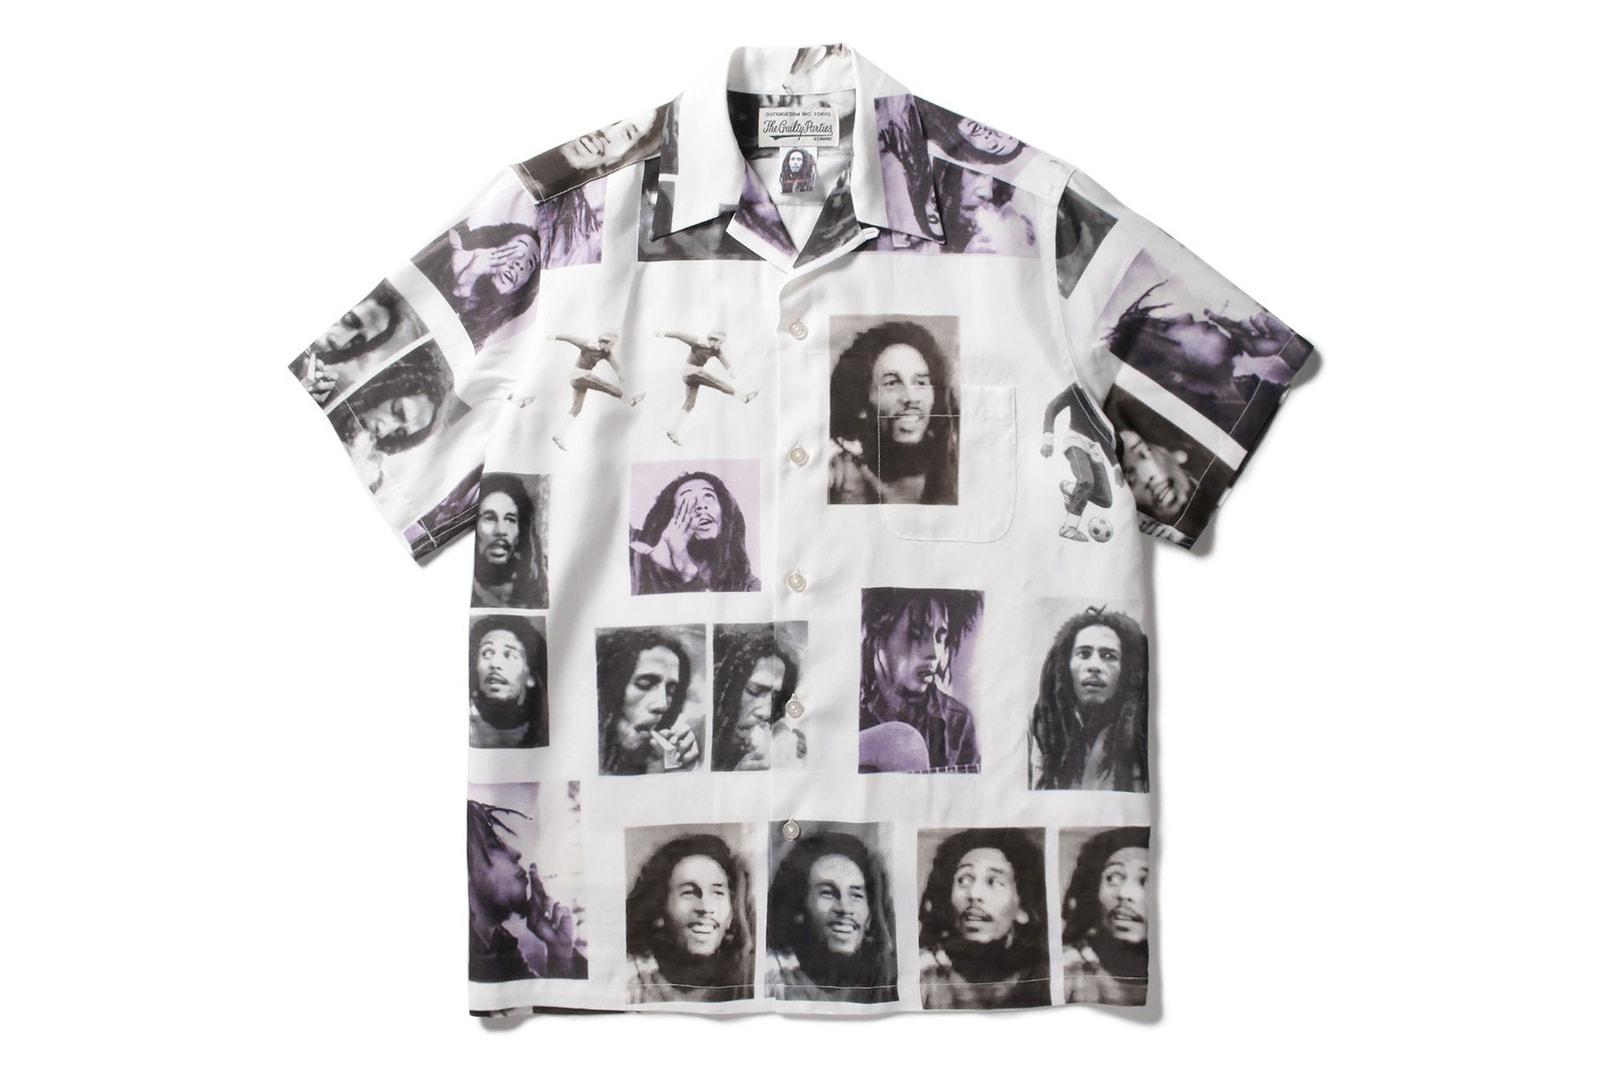 WACKO MARIA x WOLF'S HEAD 2019 Capsule Bob Marley 2019 Capsule Paradise Tokyo HANKYU MEN'S TOKYO kimono noragi wailers